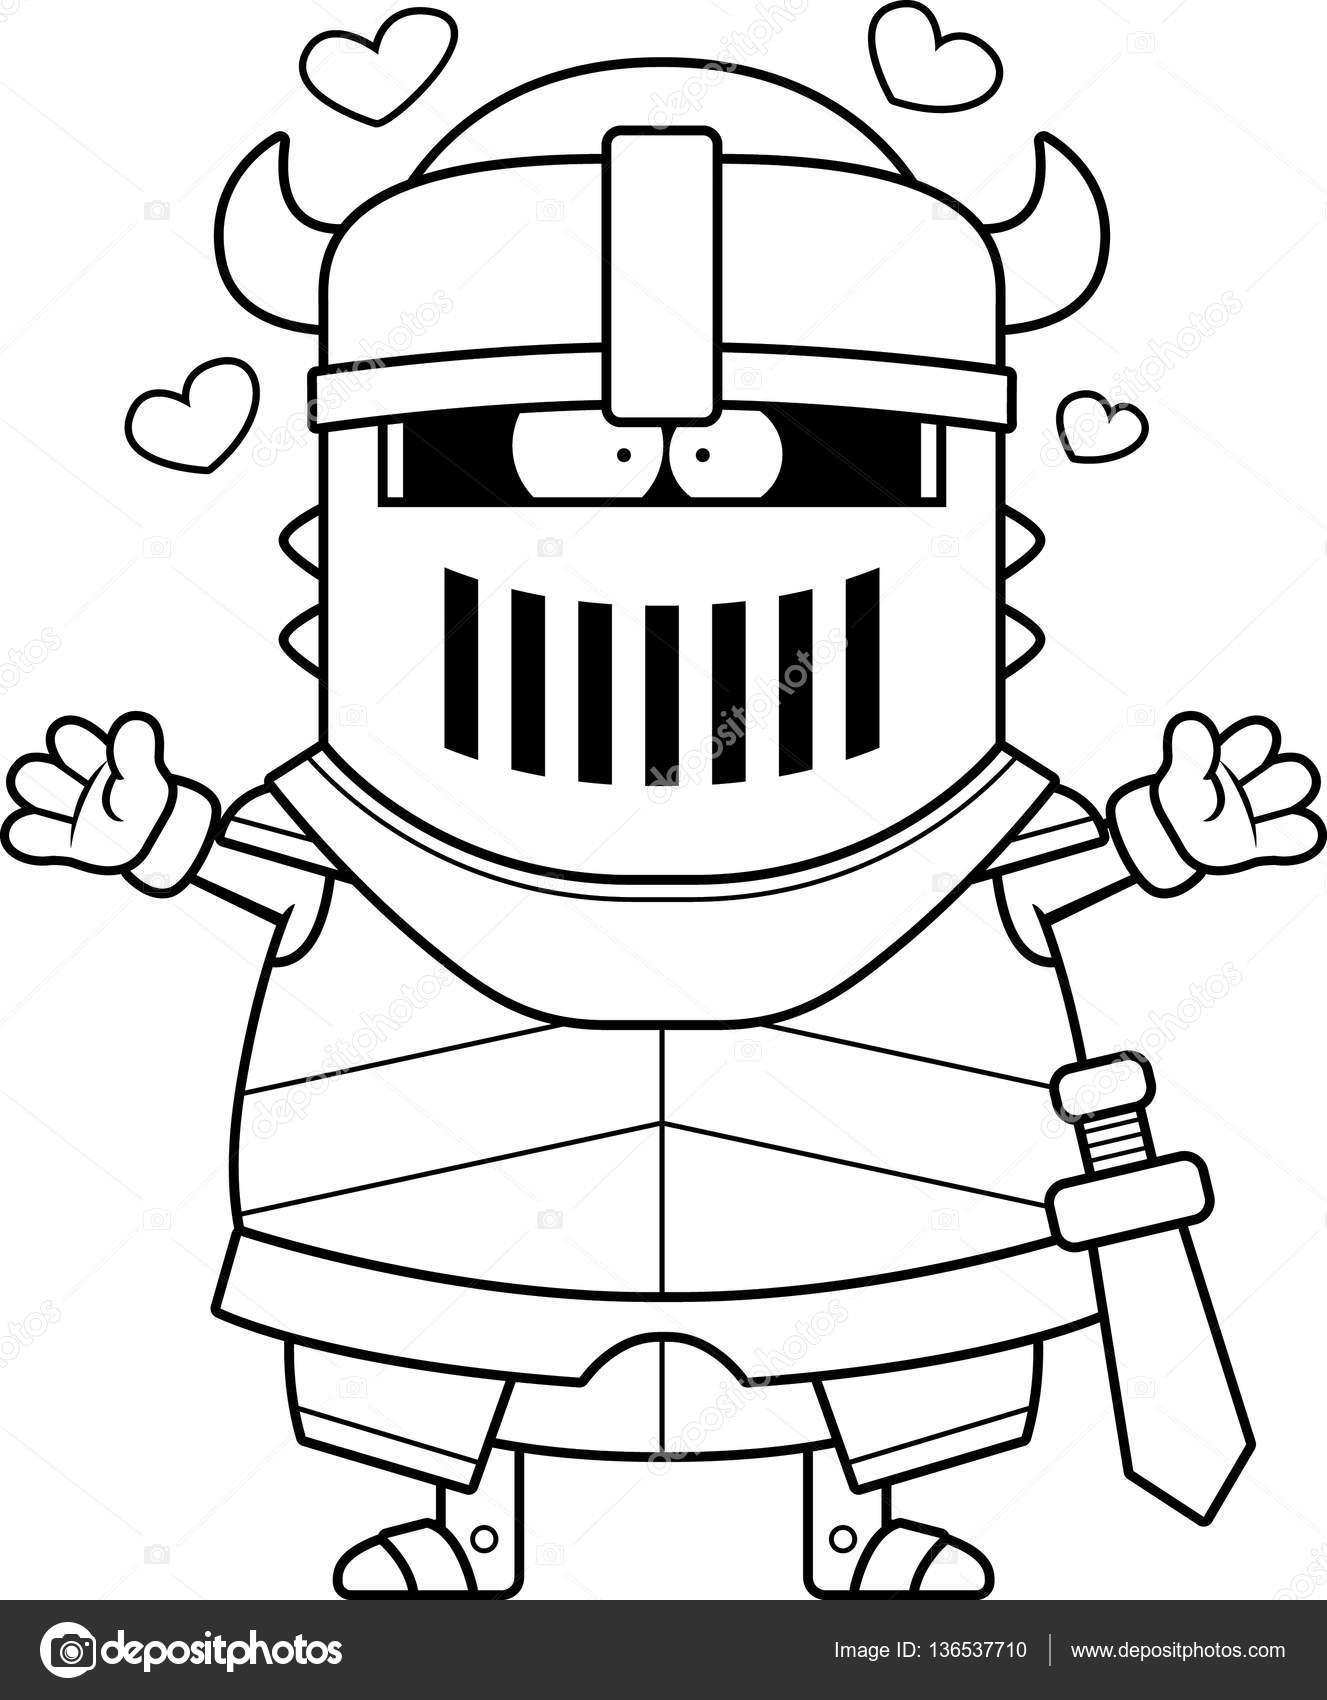 Dessin Anime Chevalier Noir Hug Image Vectorielle Cthoman C 136537710